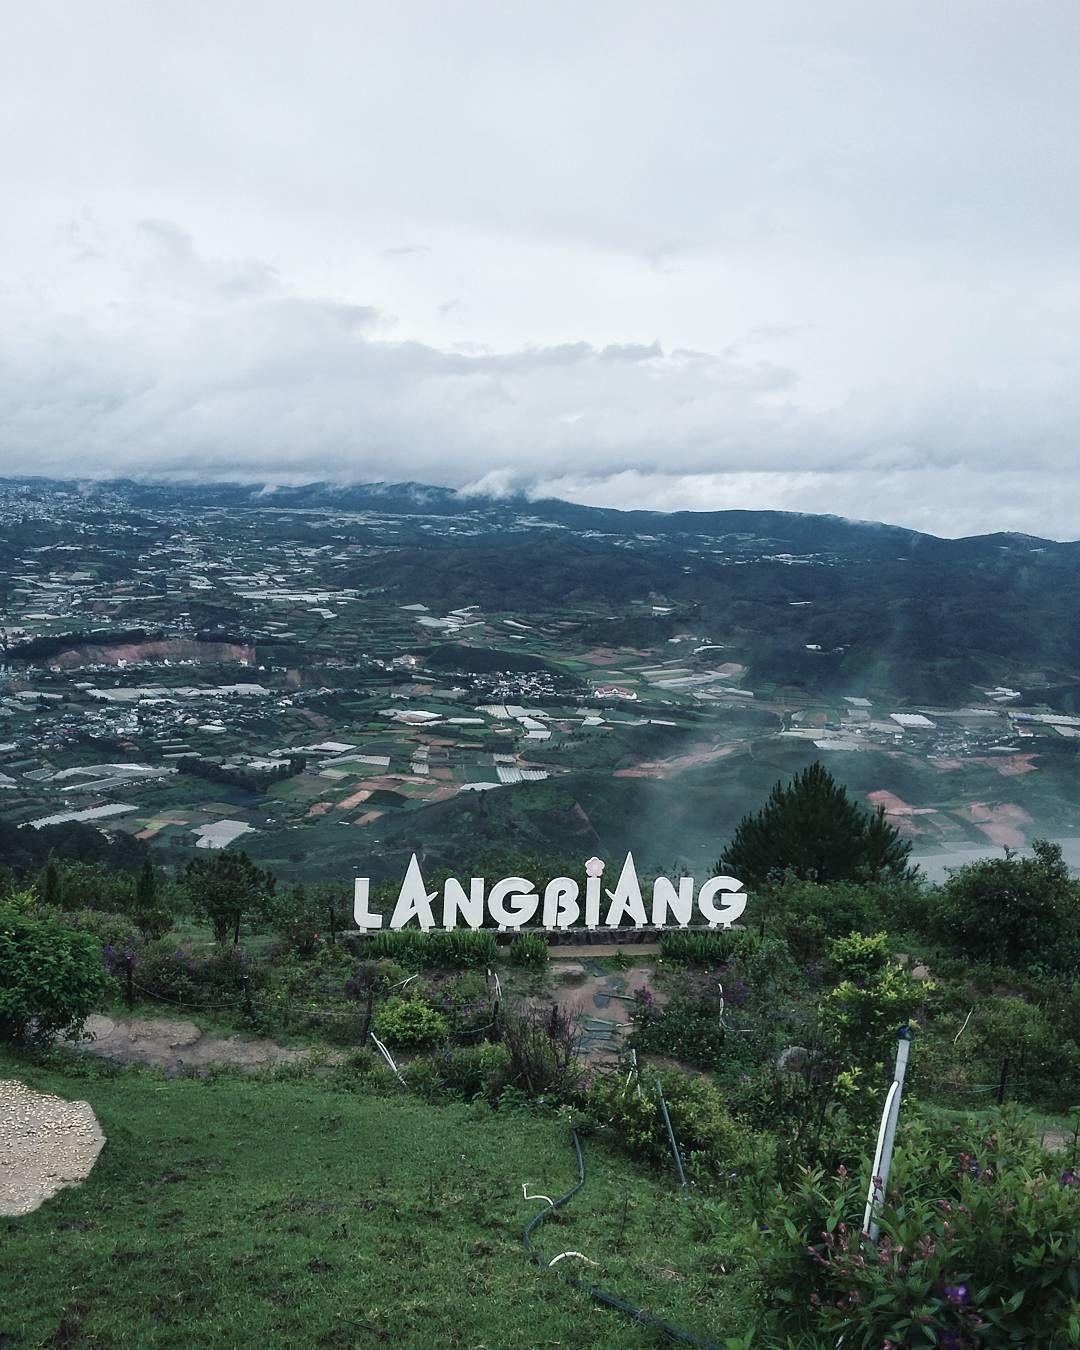 liangbiang-dalat-11